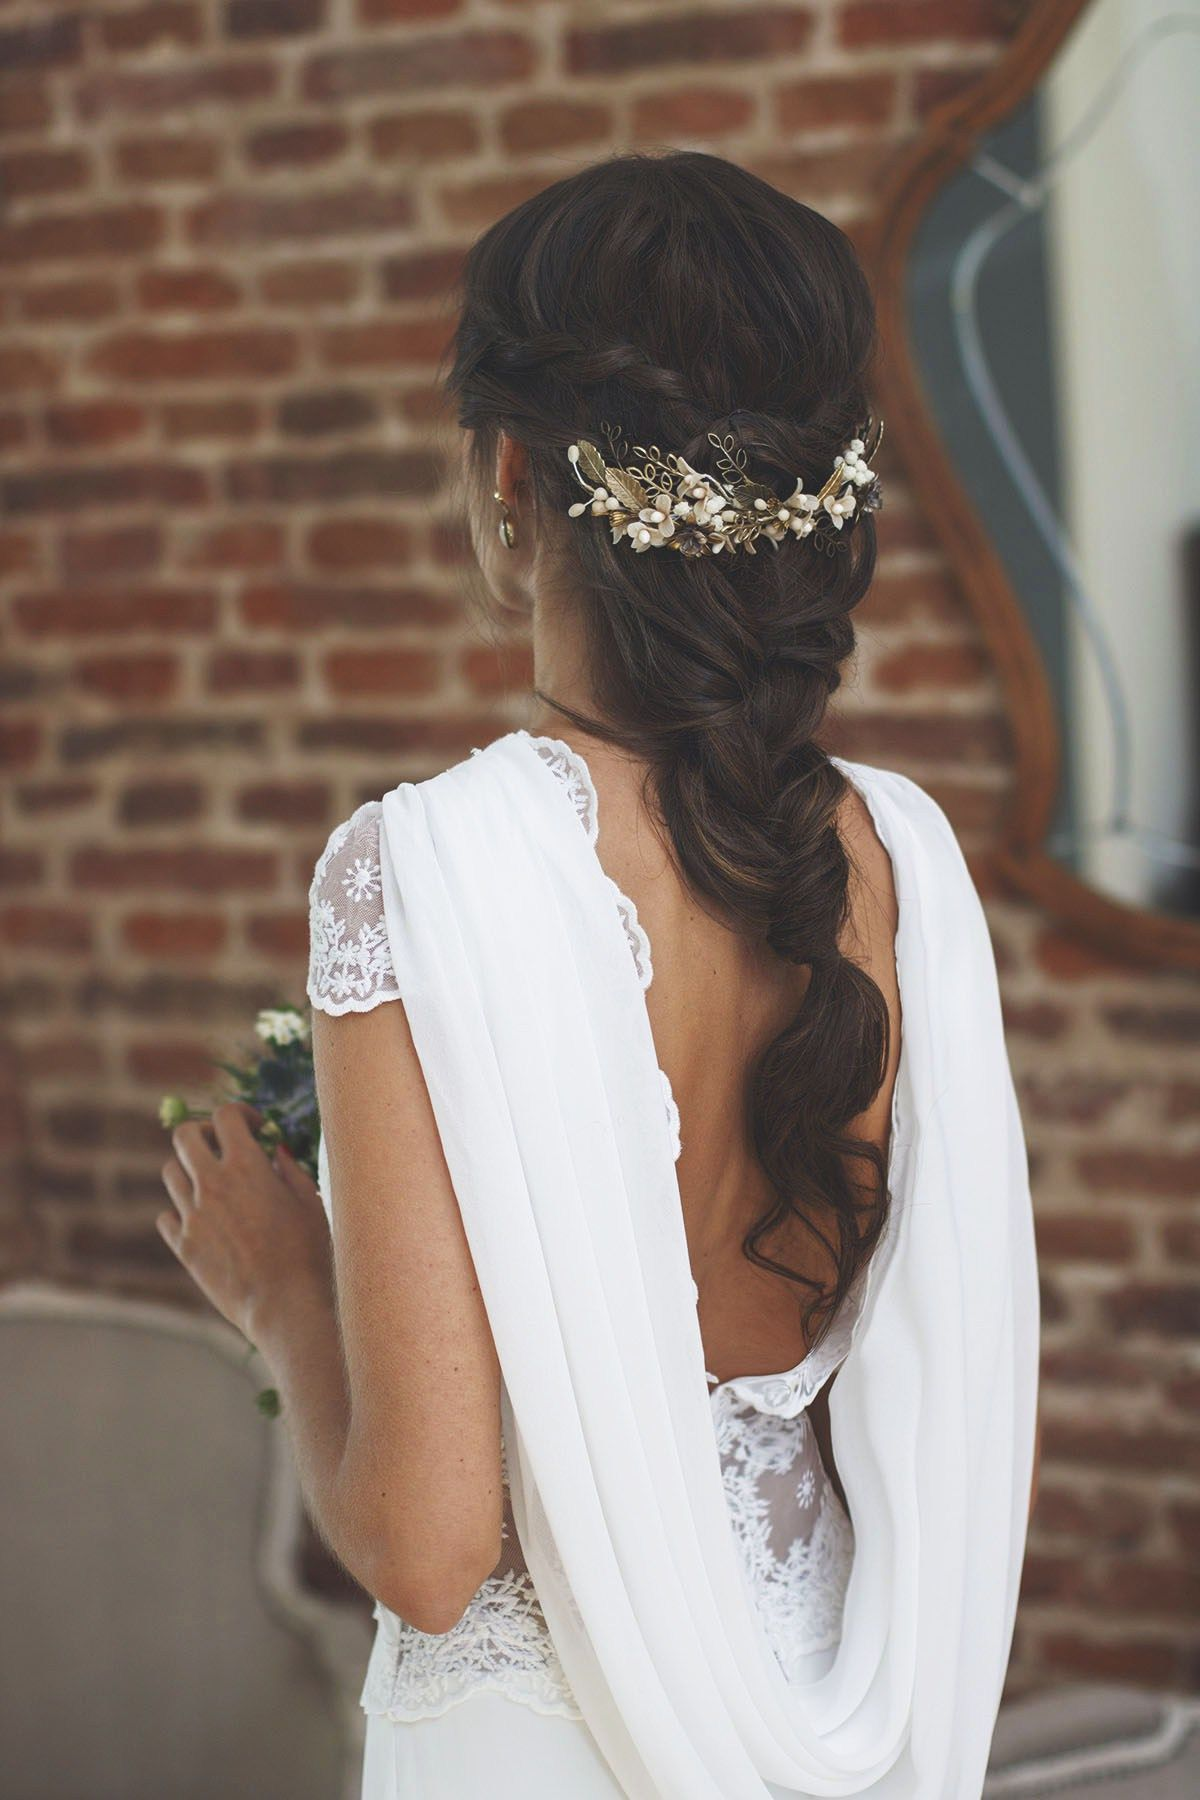 Peinado Novia Trenza Tocado Hair In 2018 Pinterest Wedding - Peinado-novia-trenza